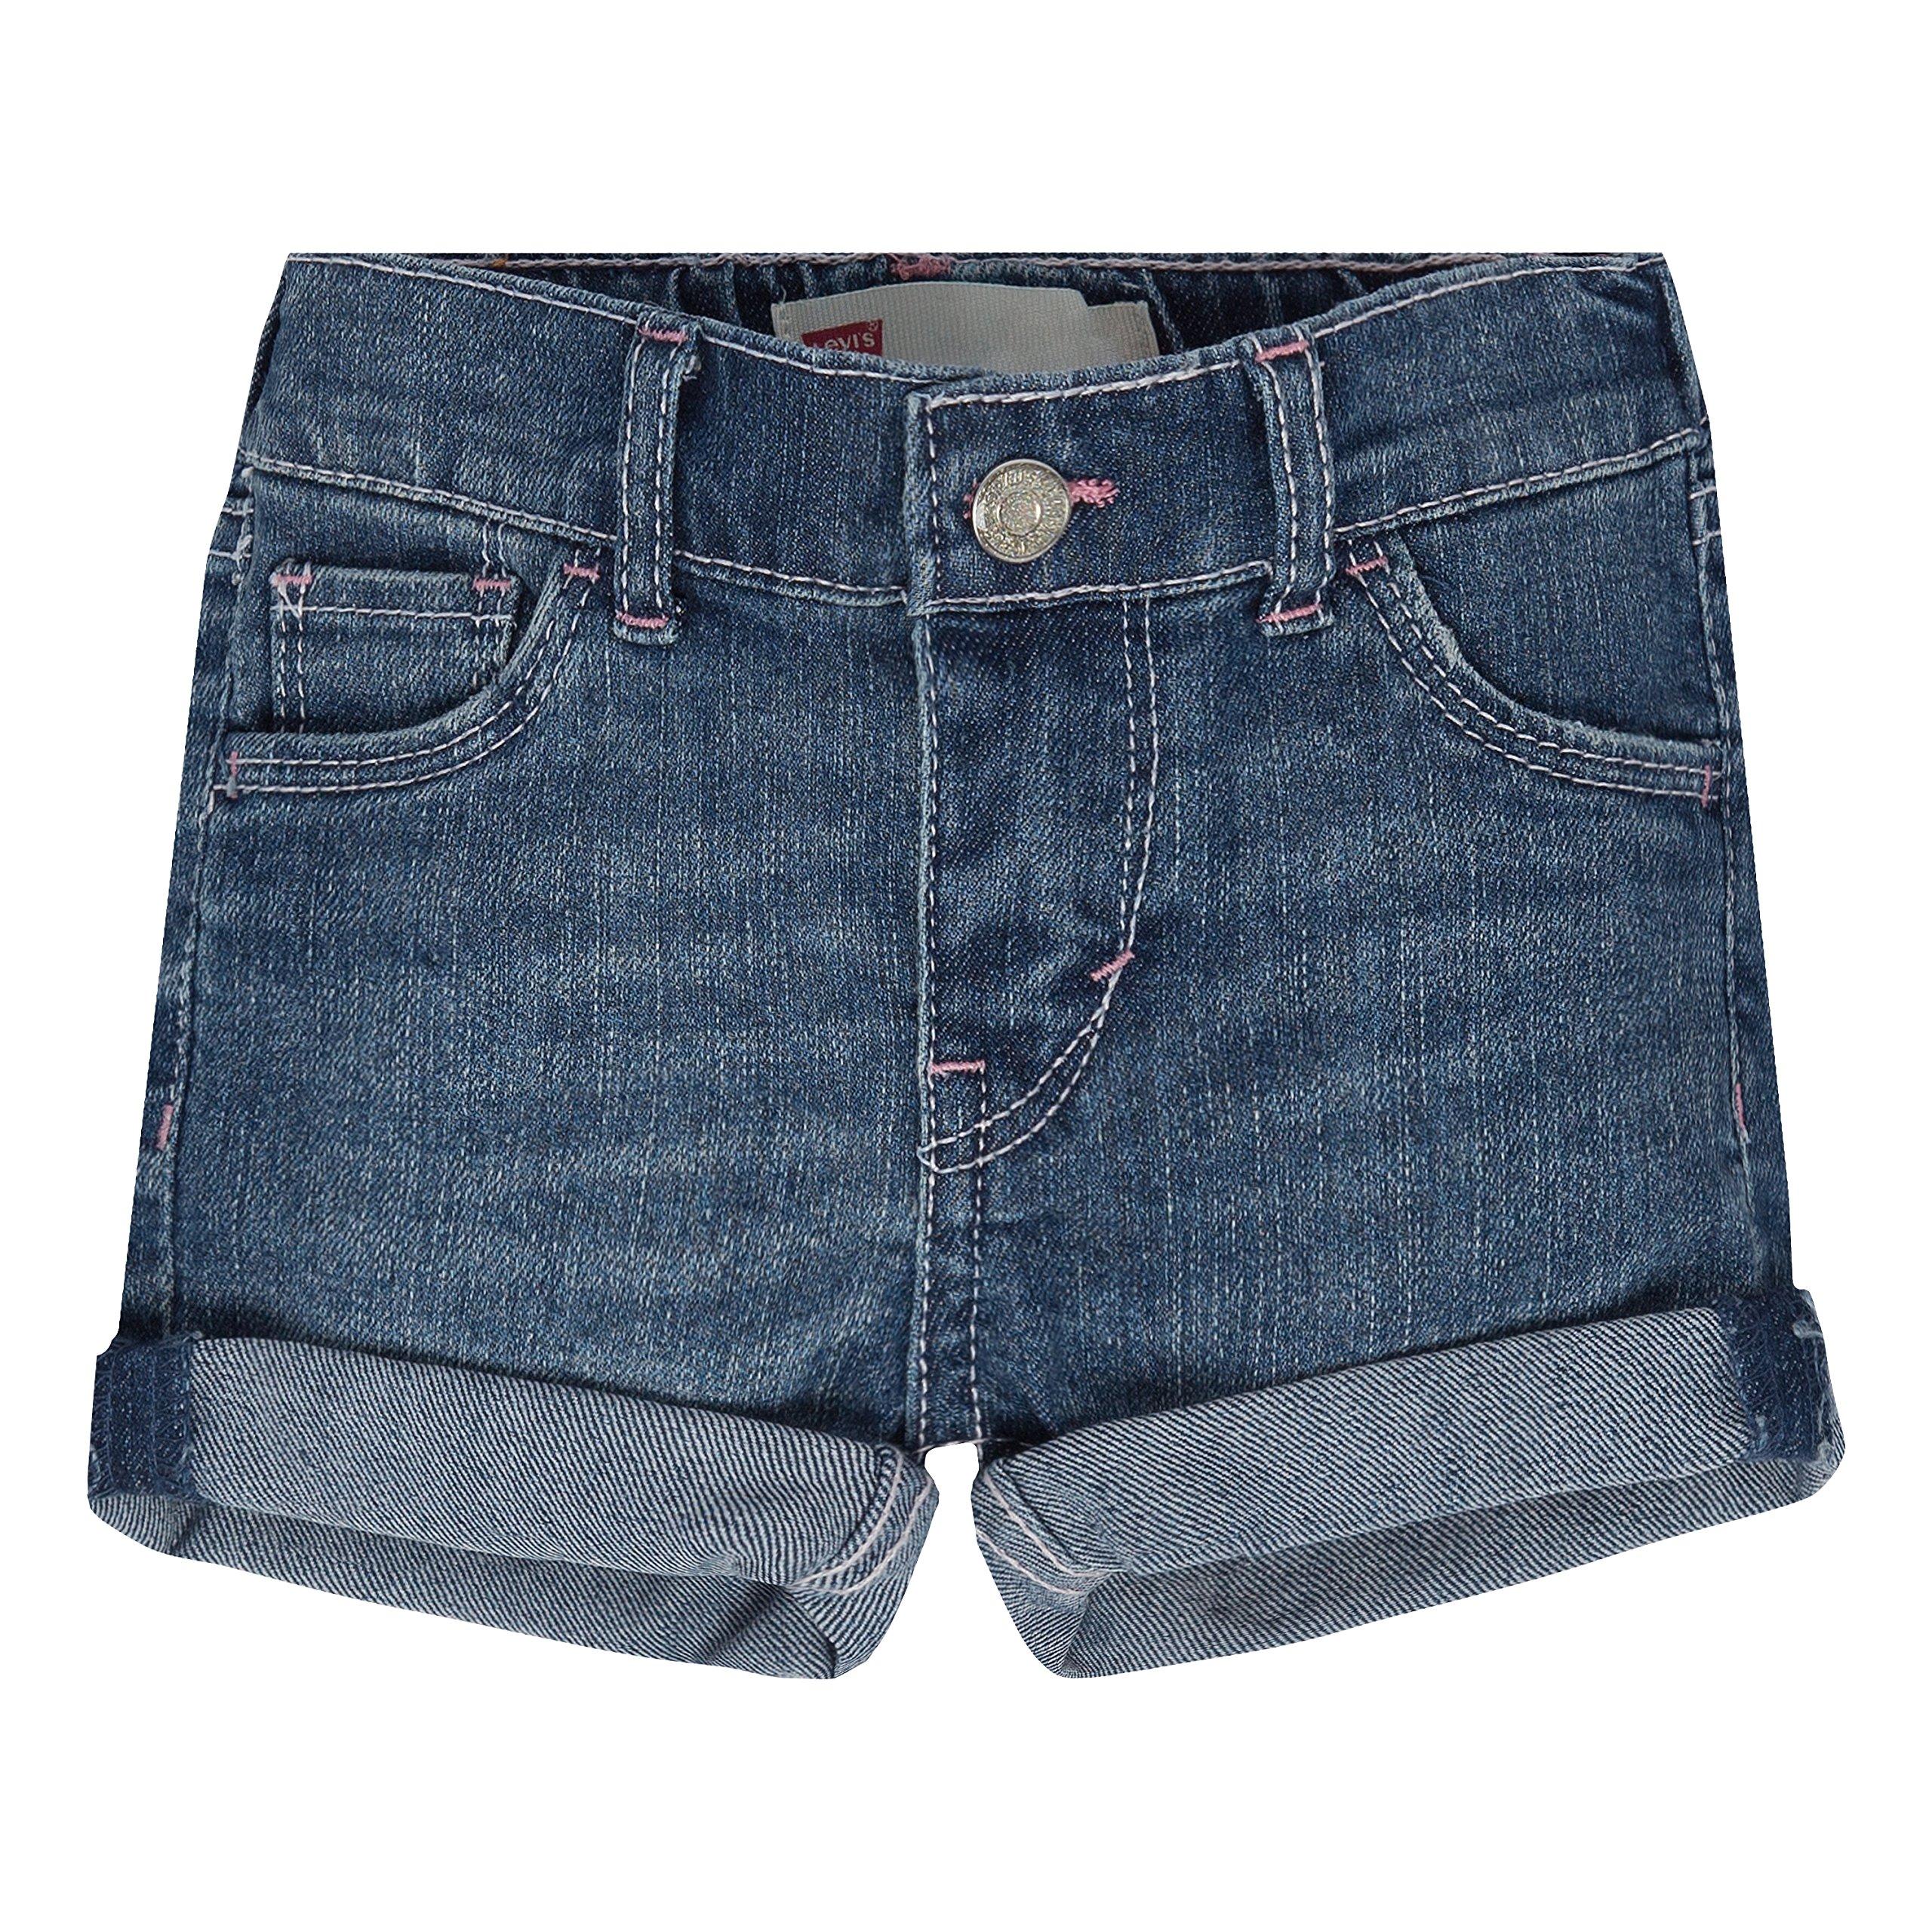 Levi's Girls' Summer Love Shorty Shorts, Fiji Blue, 18M